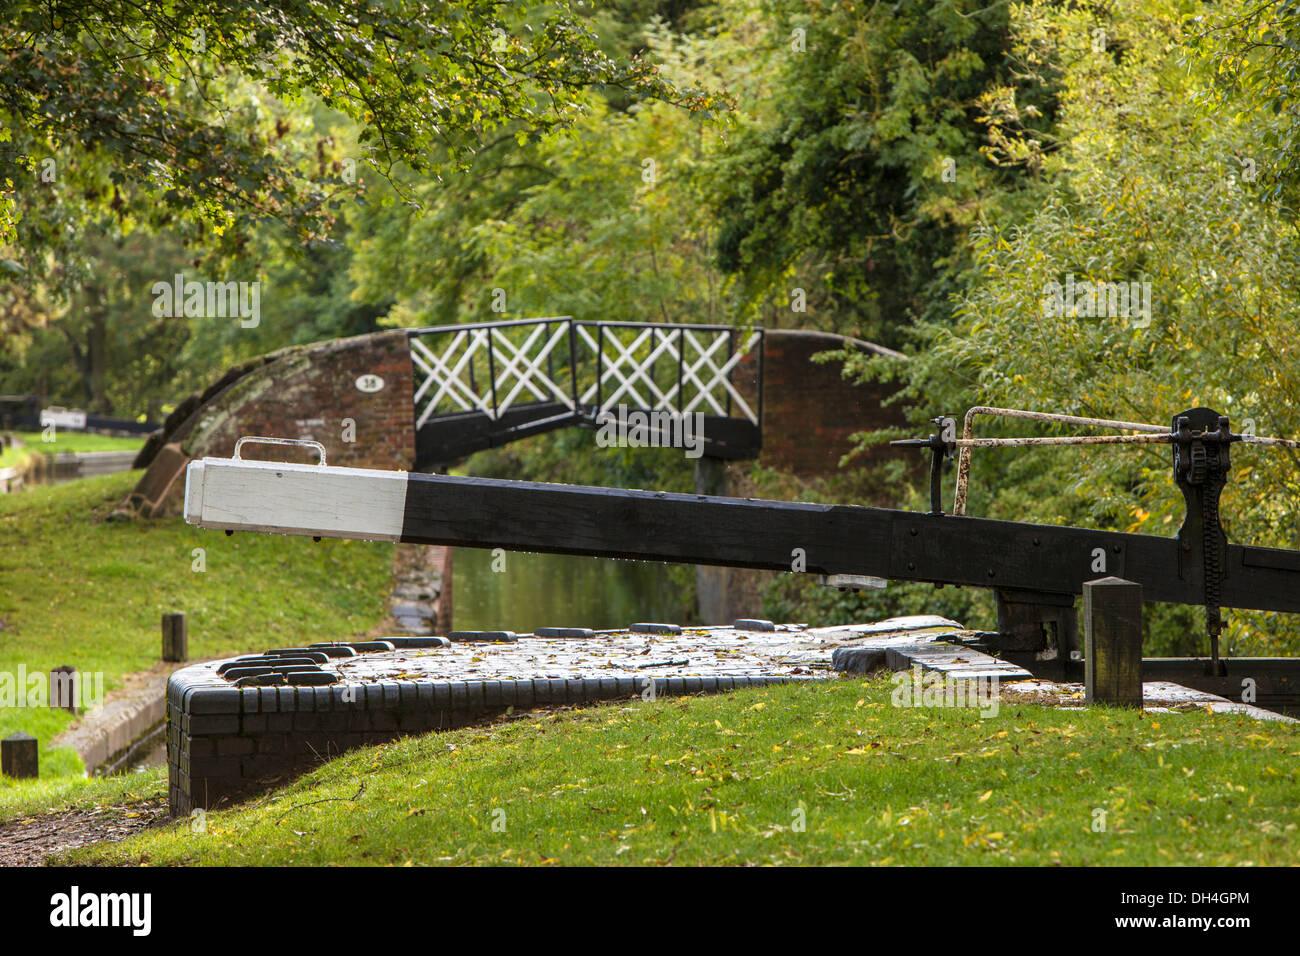 Early autumn on the Stratford upon Avon Canal, Lapworth, Warwickshire, England, UK - Stock Image